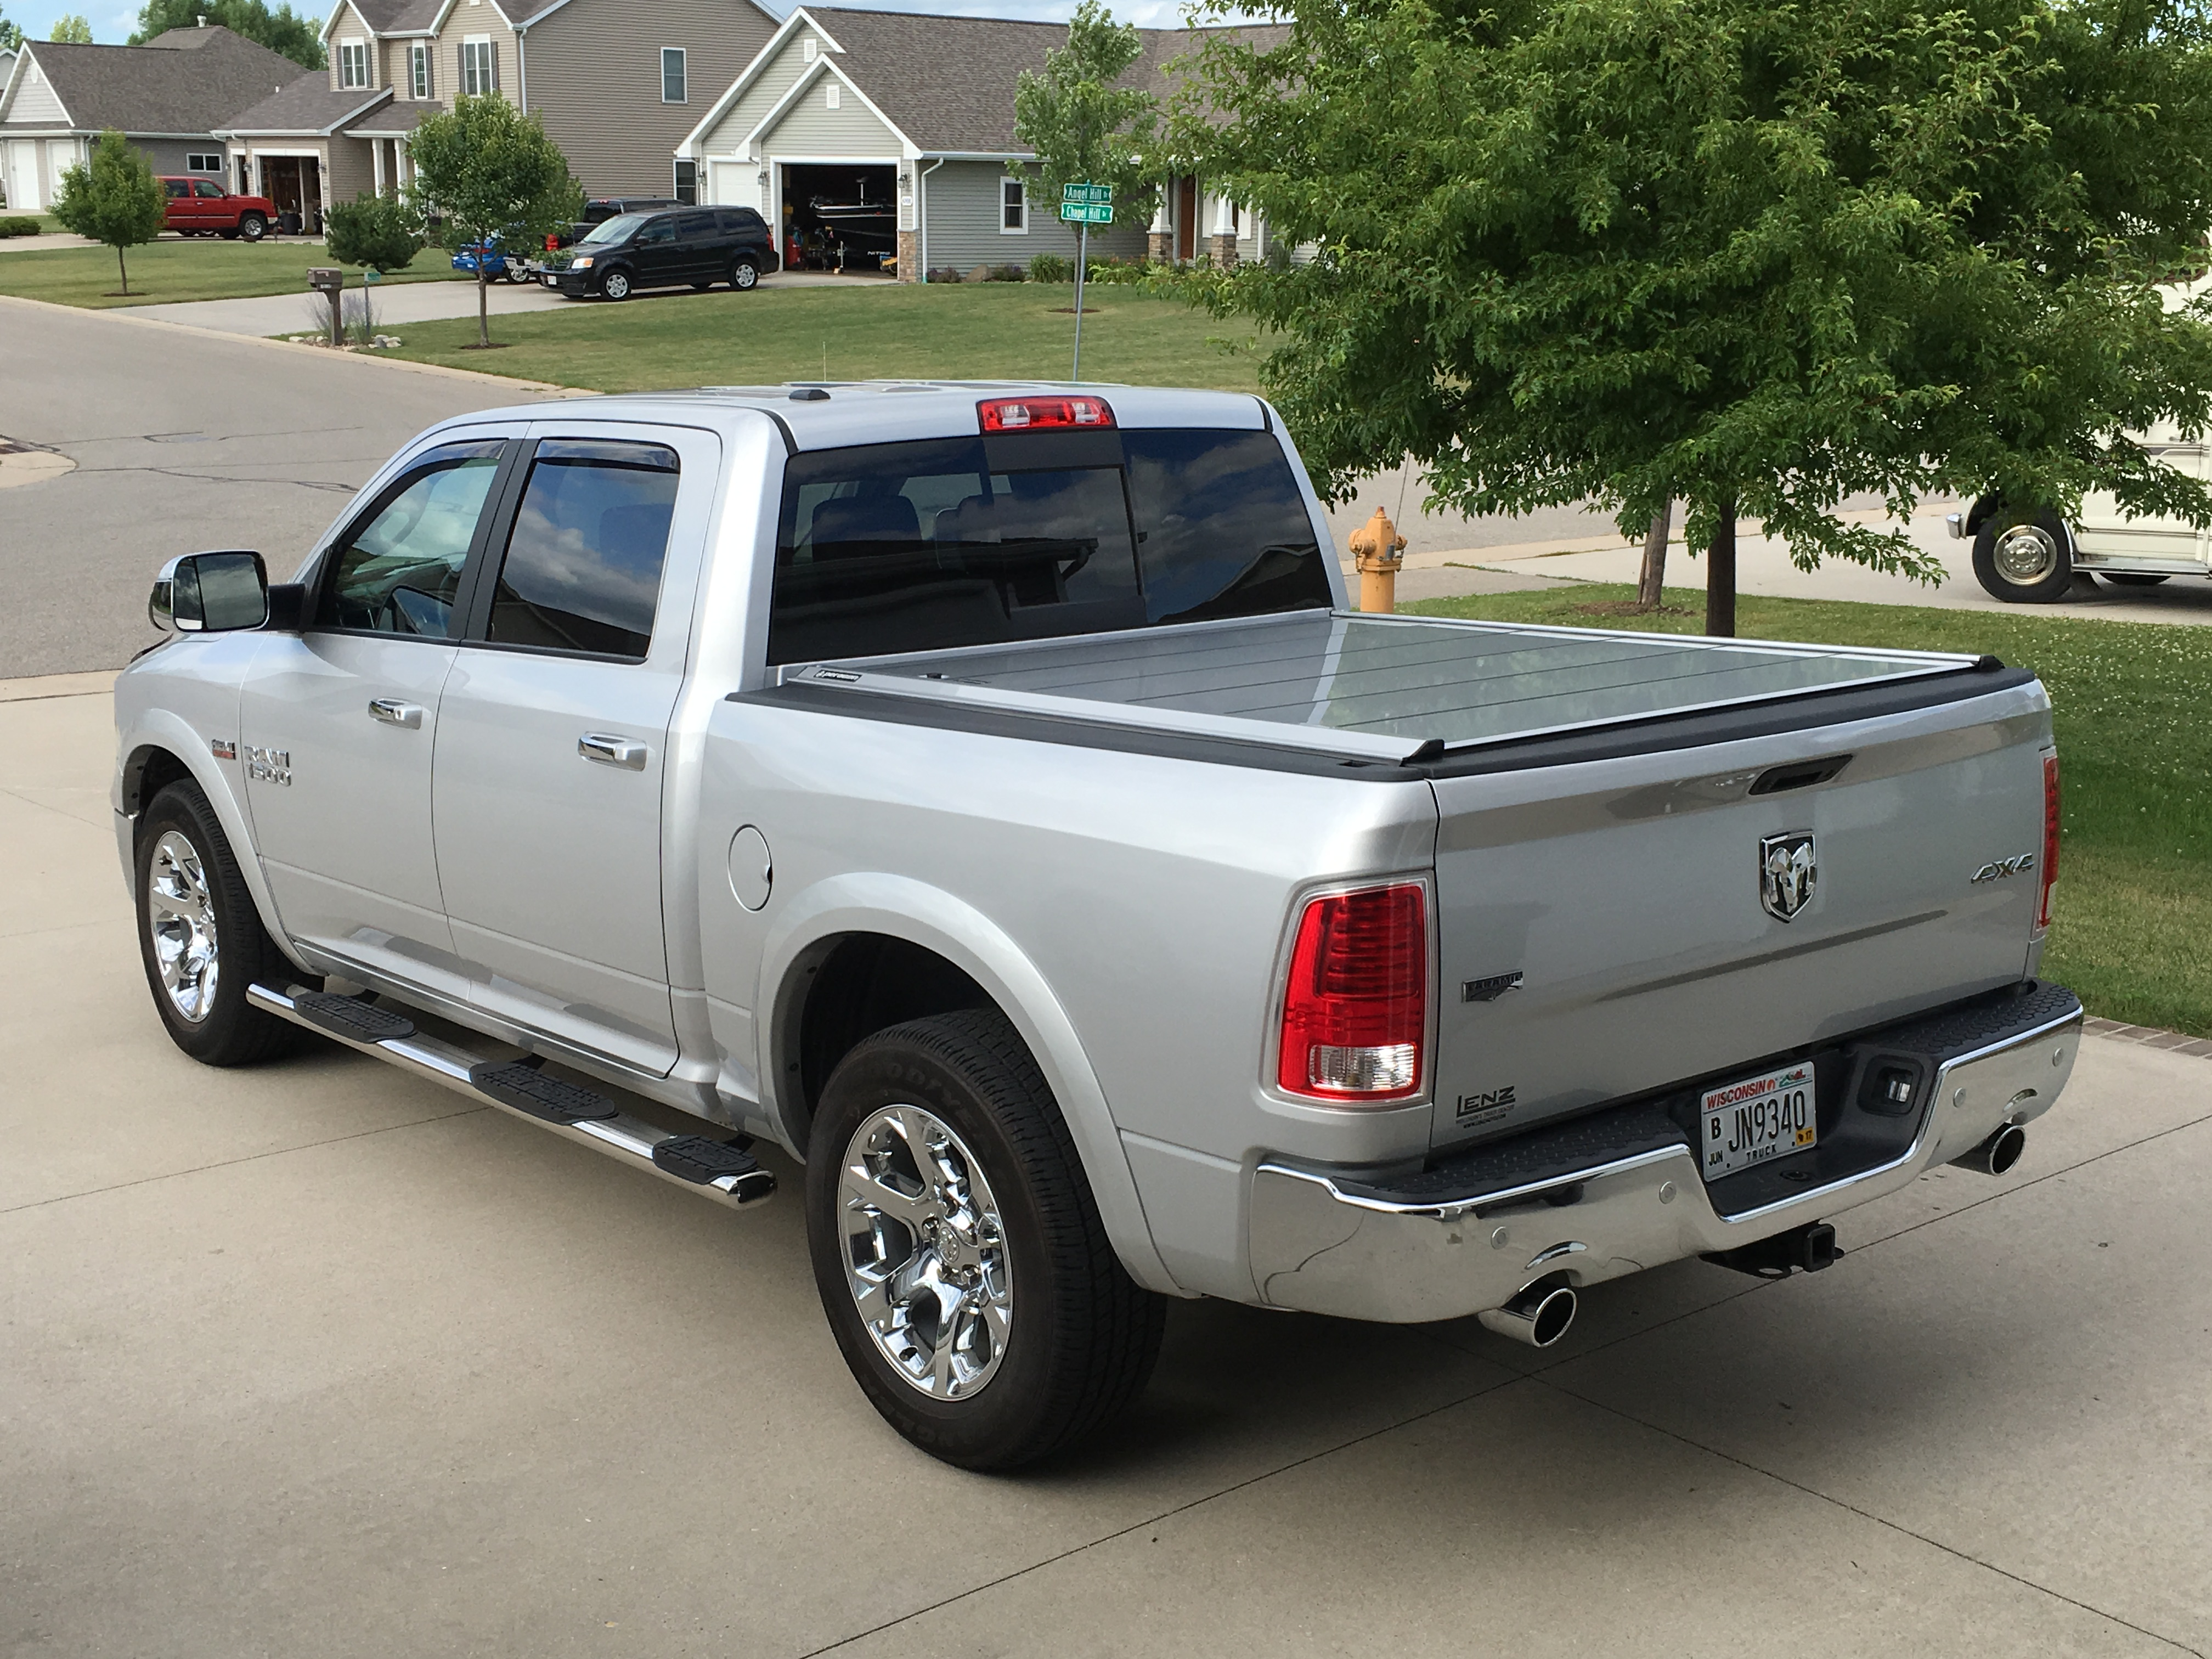 Peragon Retractable Truck Bed Covers For Dodge Dakota